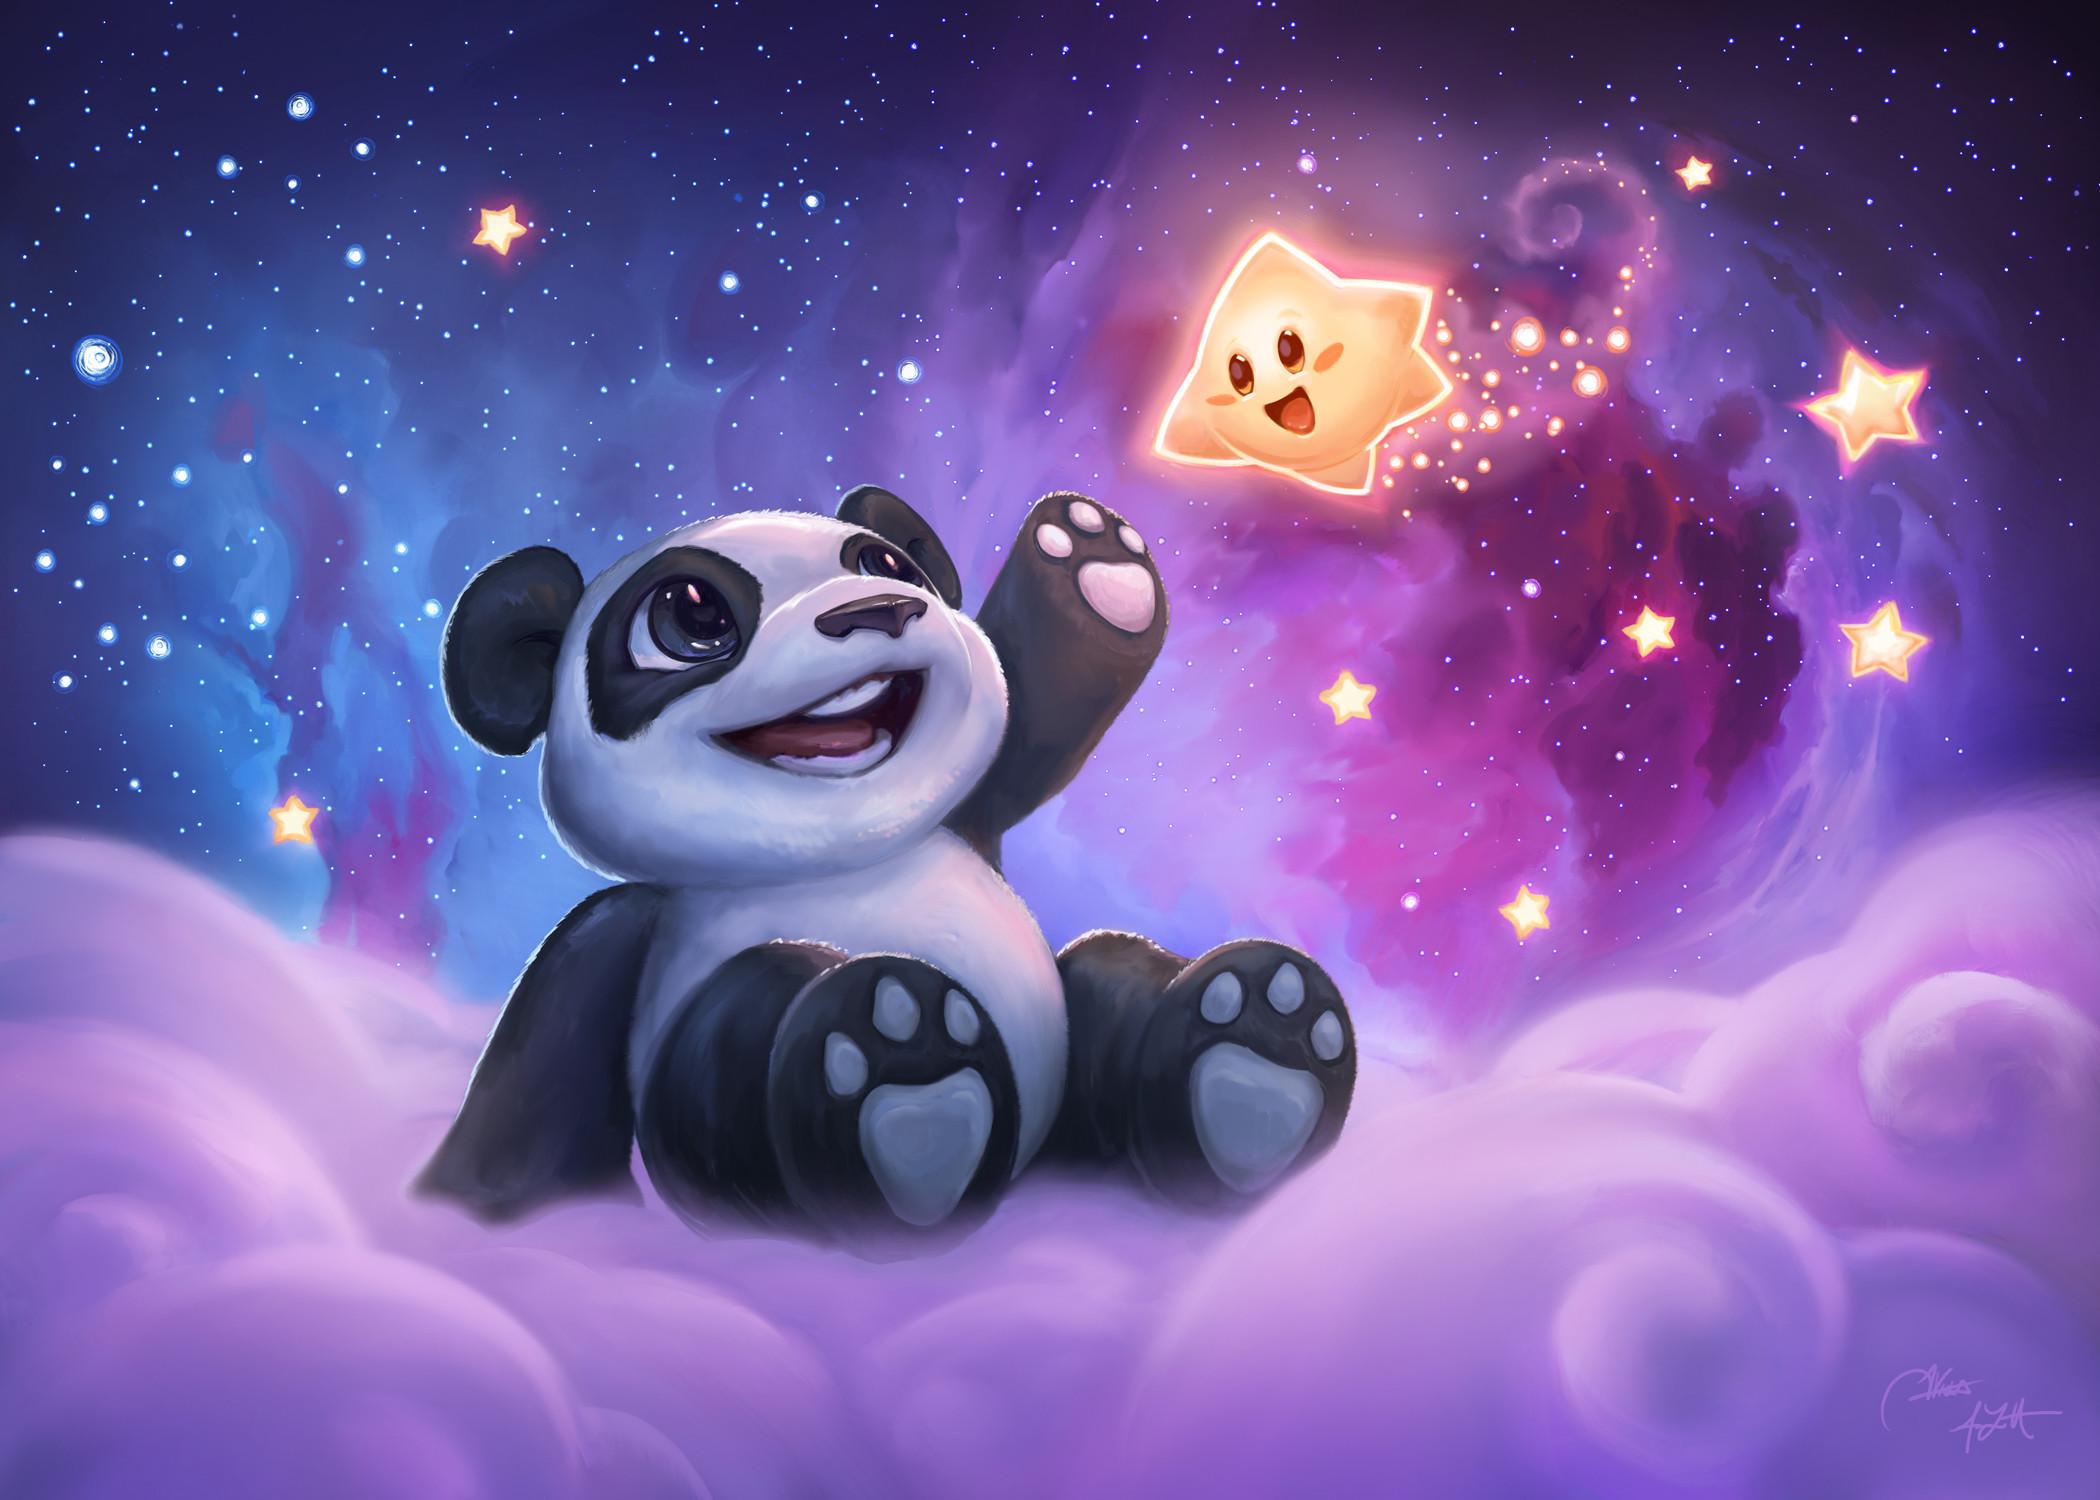 Reach for the stars little panda!